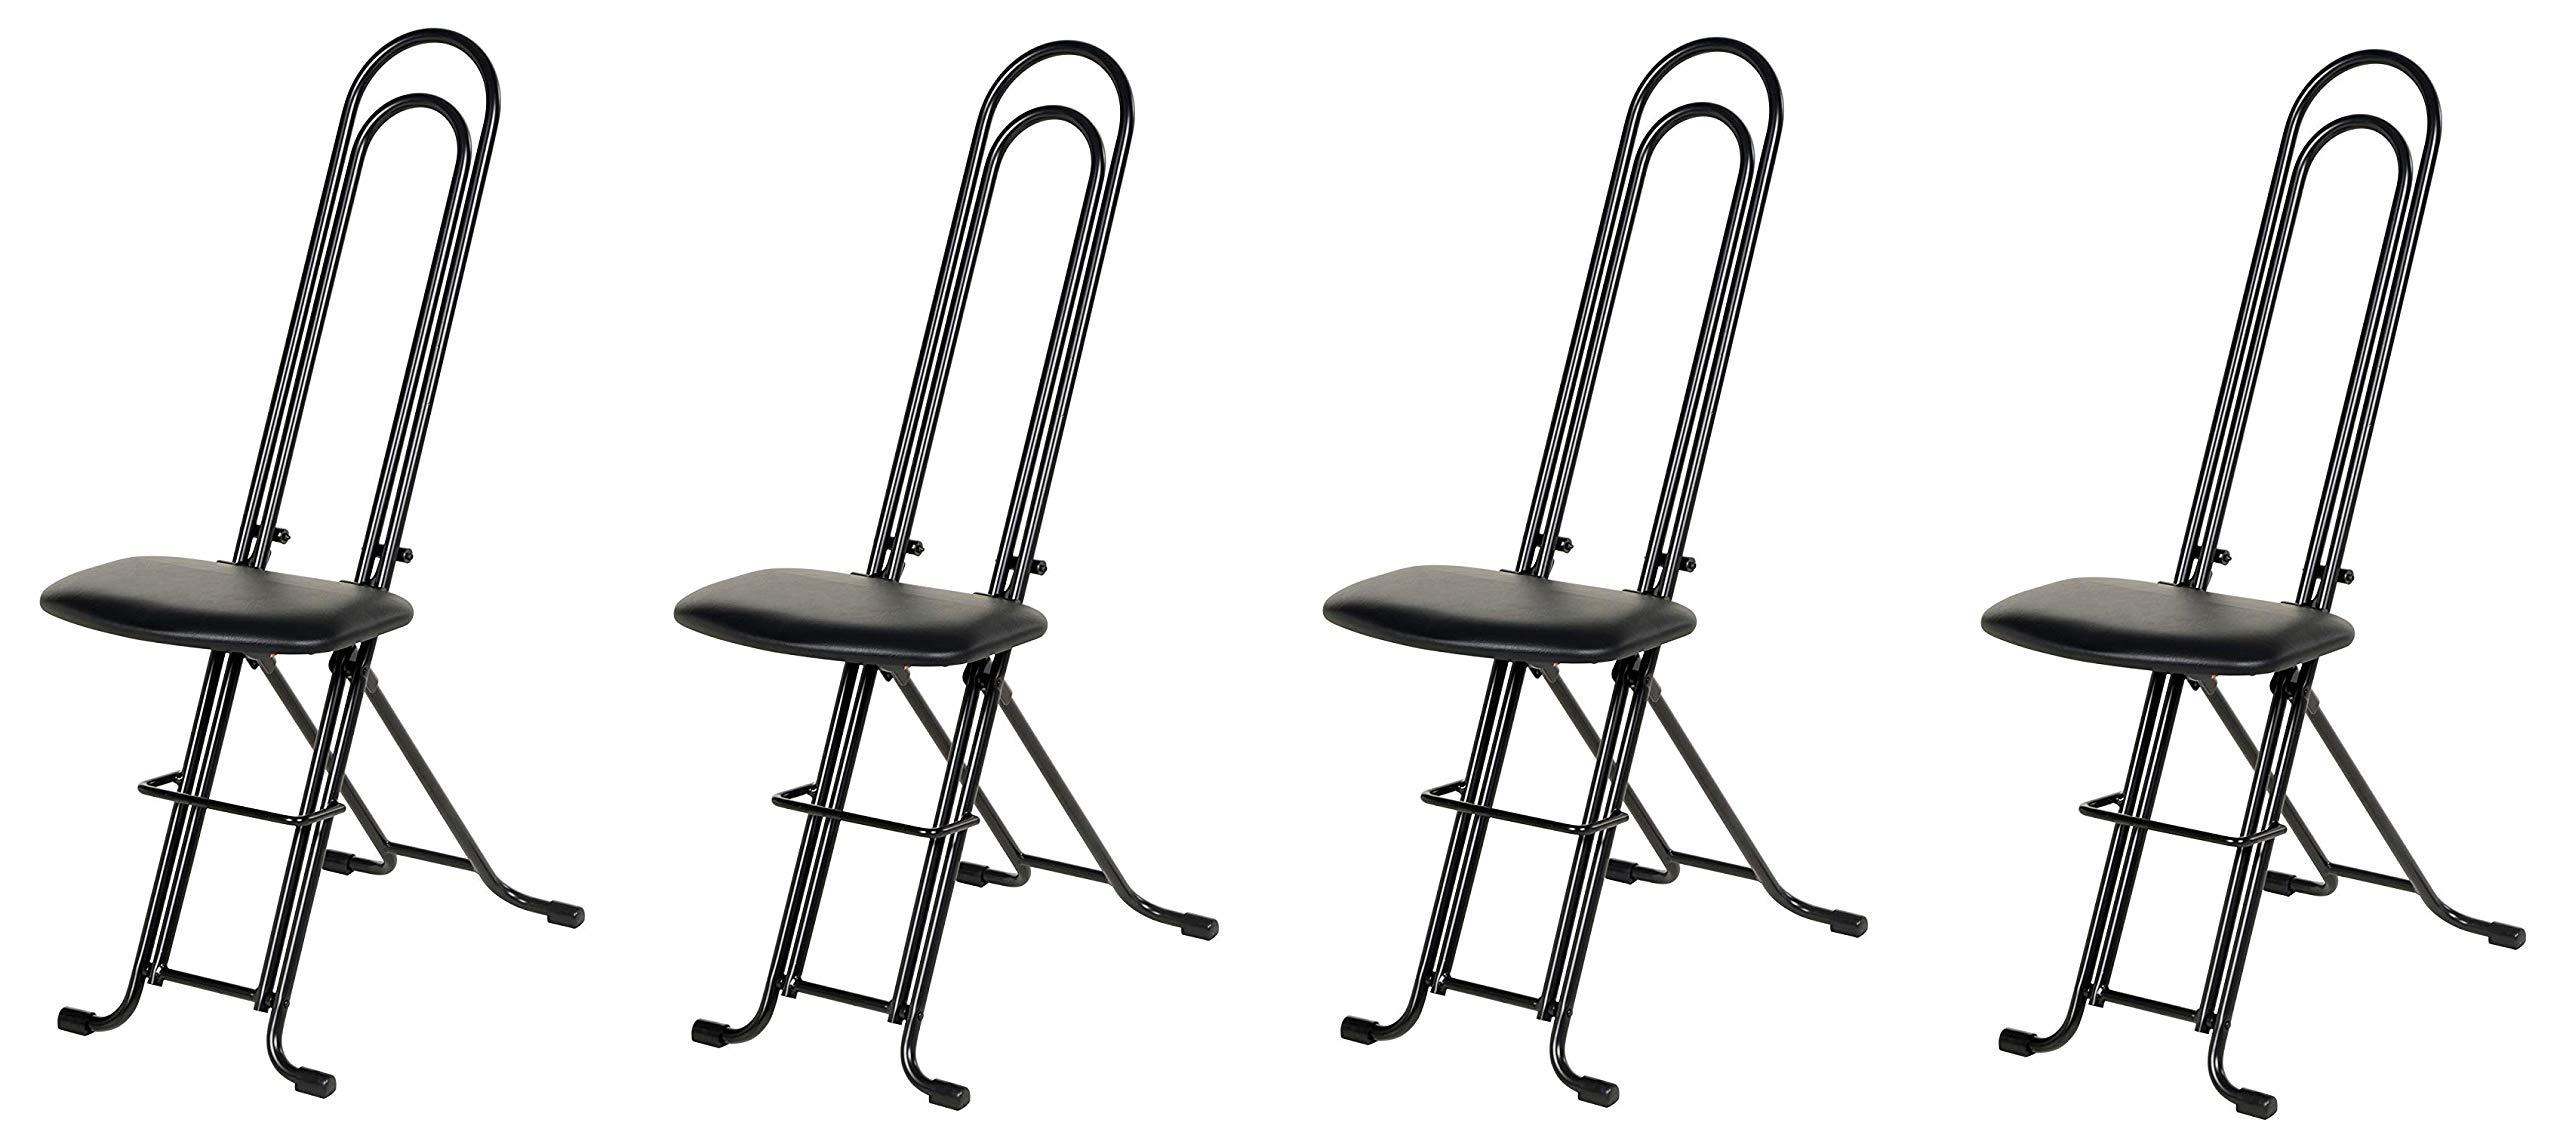 Vestil CPRO-800LP Ergonomic Worker Seat/Chair, 13-1/2'' Width, 10'' Depth, 300 lb. Capacity, 18'' - 33'' Height Range (Pack of 4)